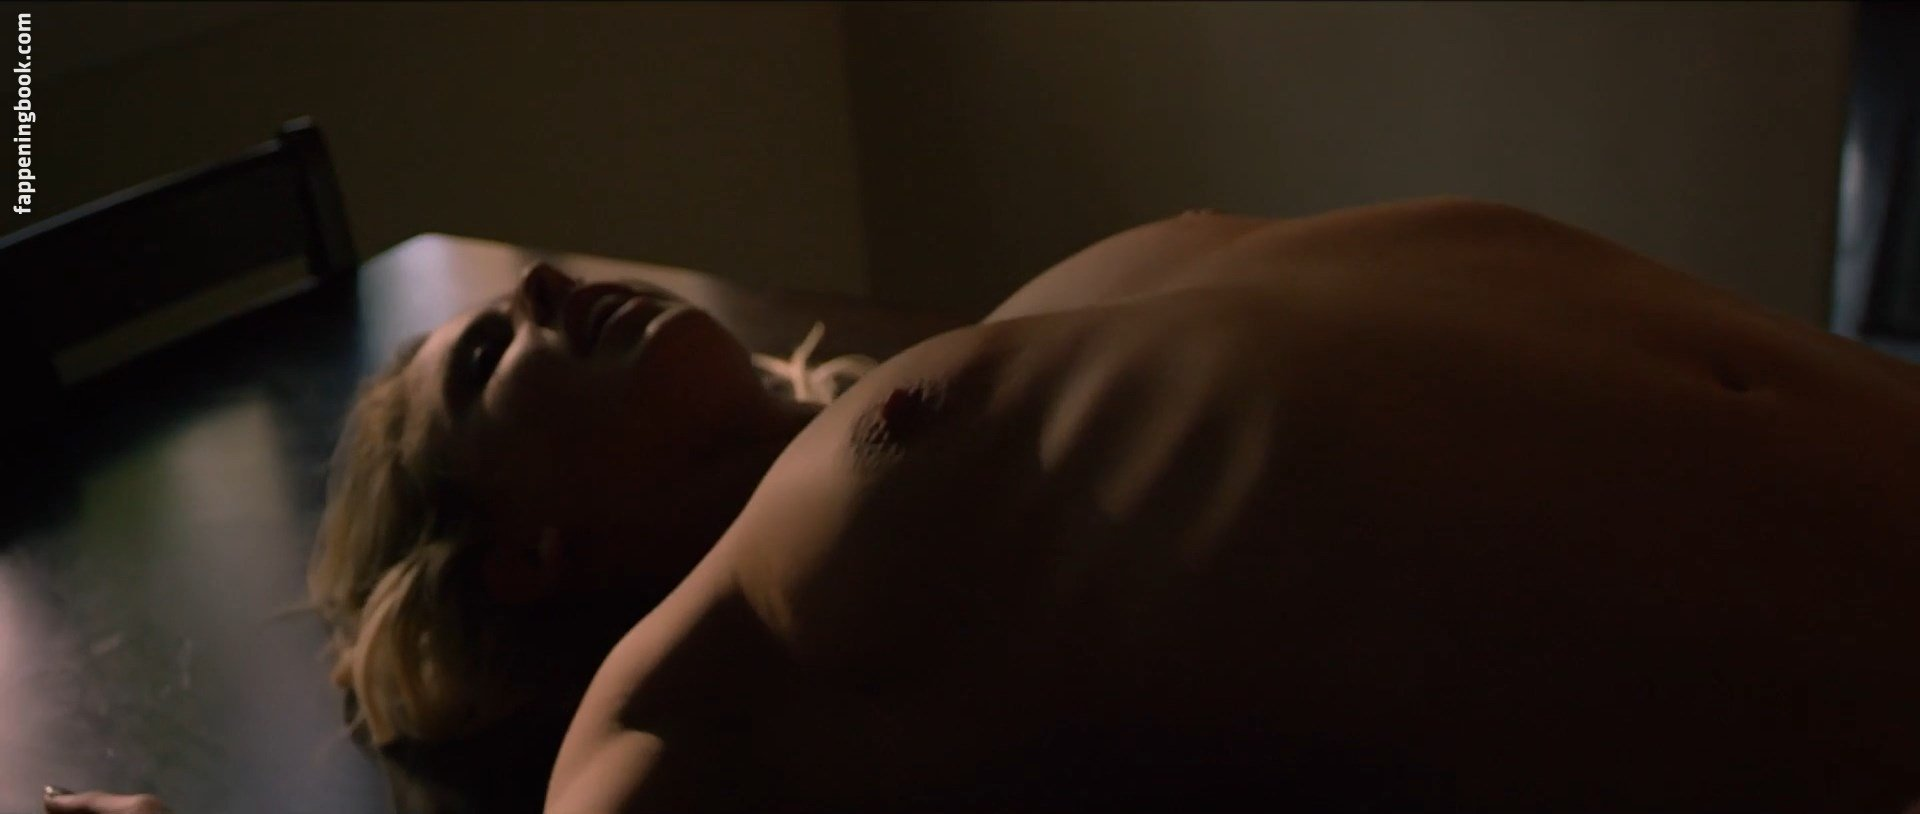 Faith Melissa Lanford Nude